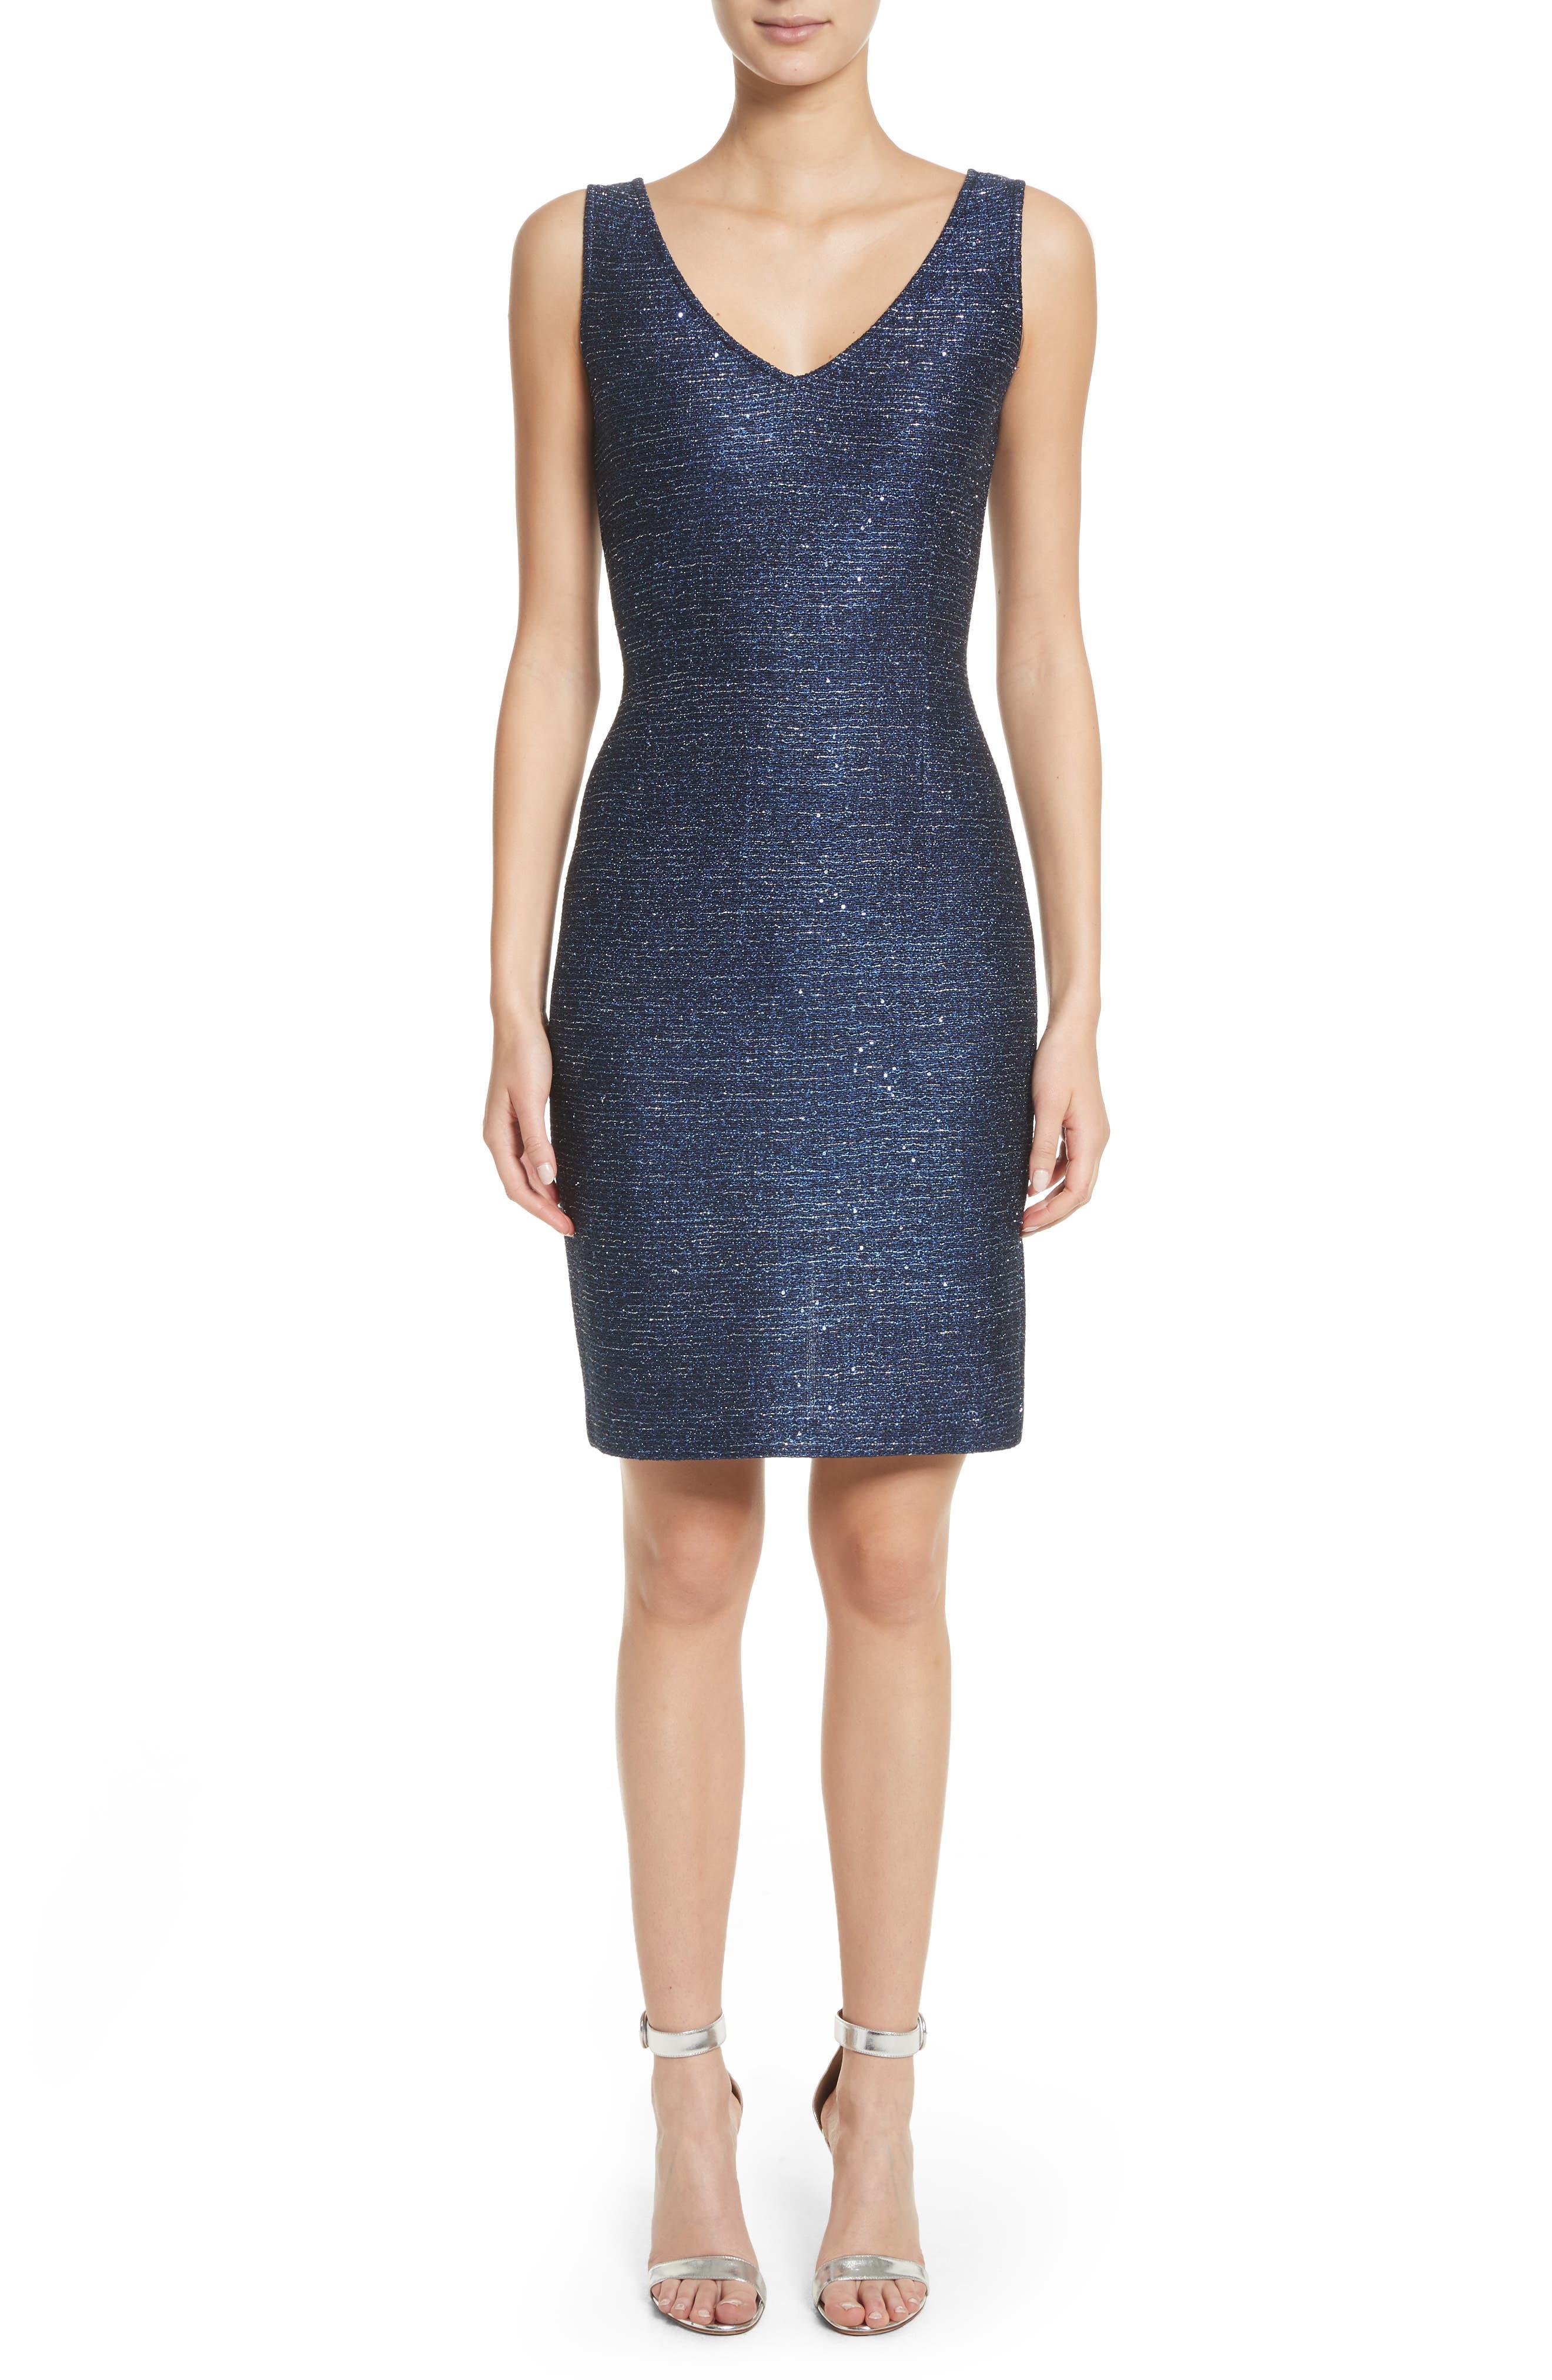 Alternate Image 1 Selected - St. John Collection Sparkle Knit Sheath Dress